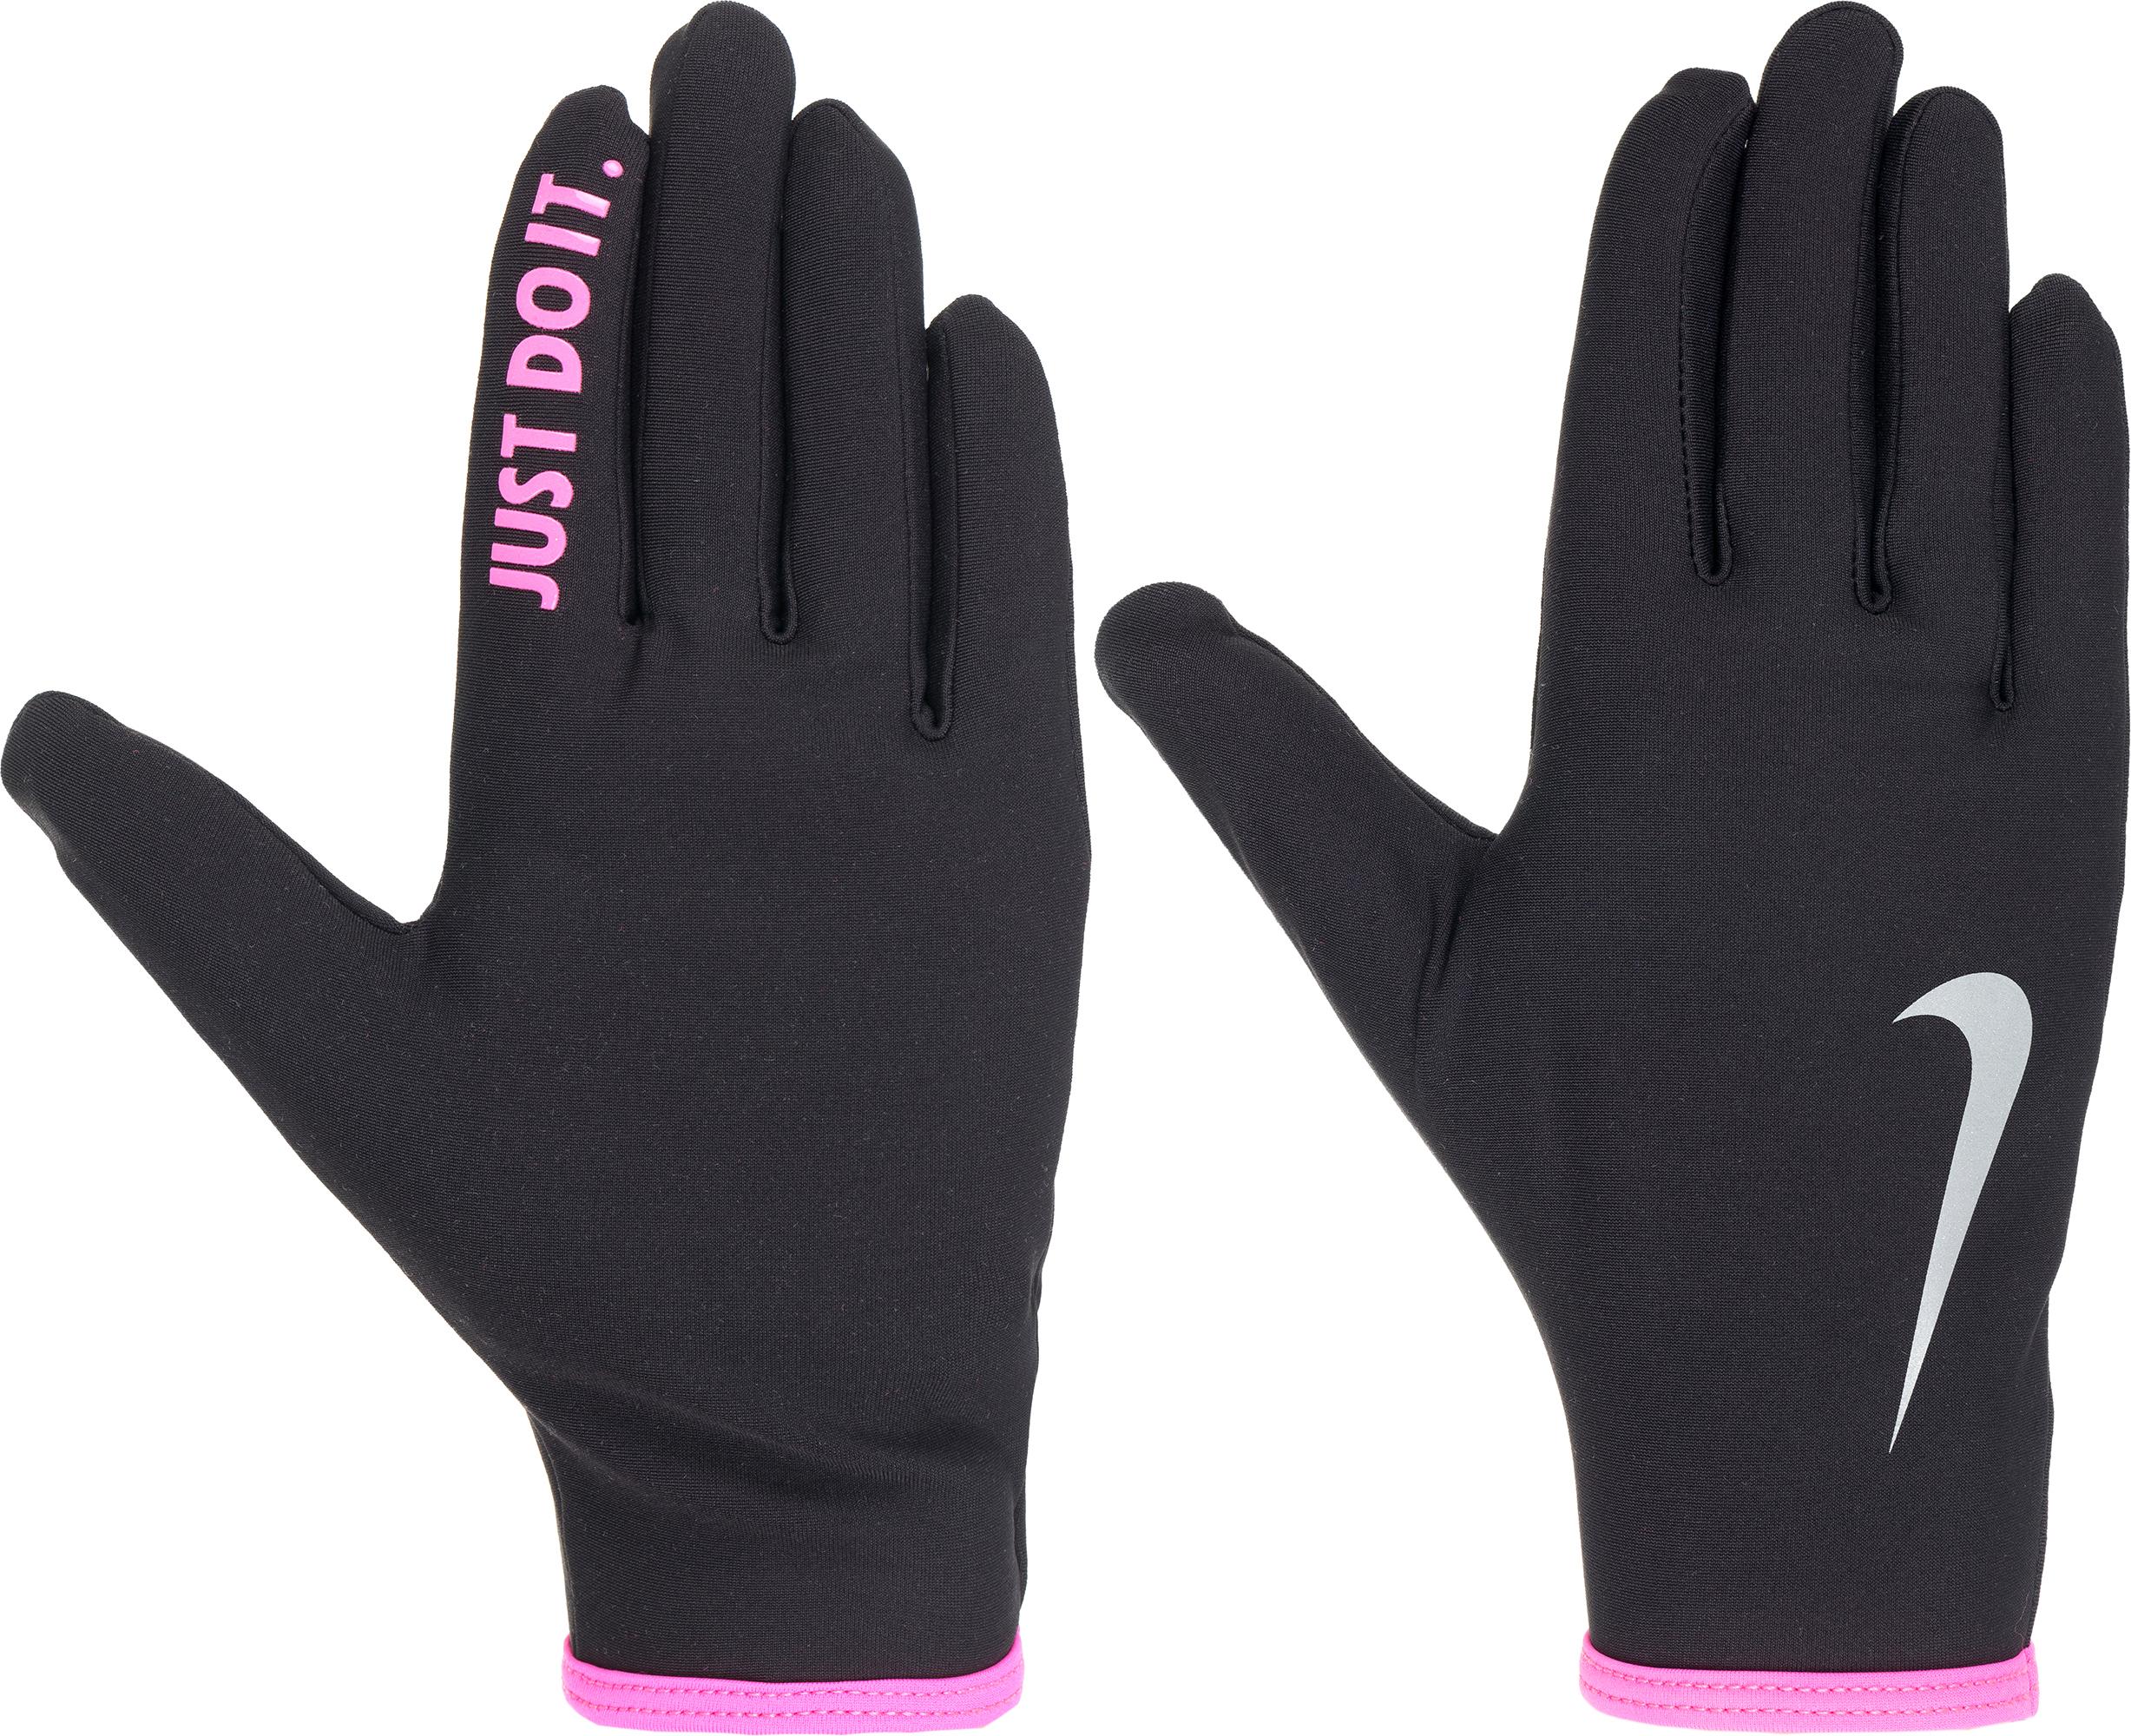 Nike Перчатки женские Nike, размер S nike перчатки для бега nike n rg 31 046 черный